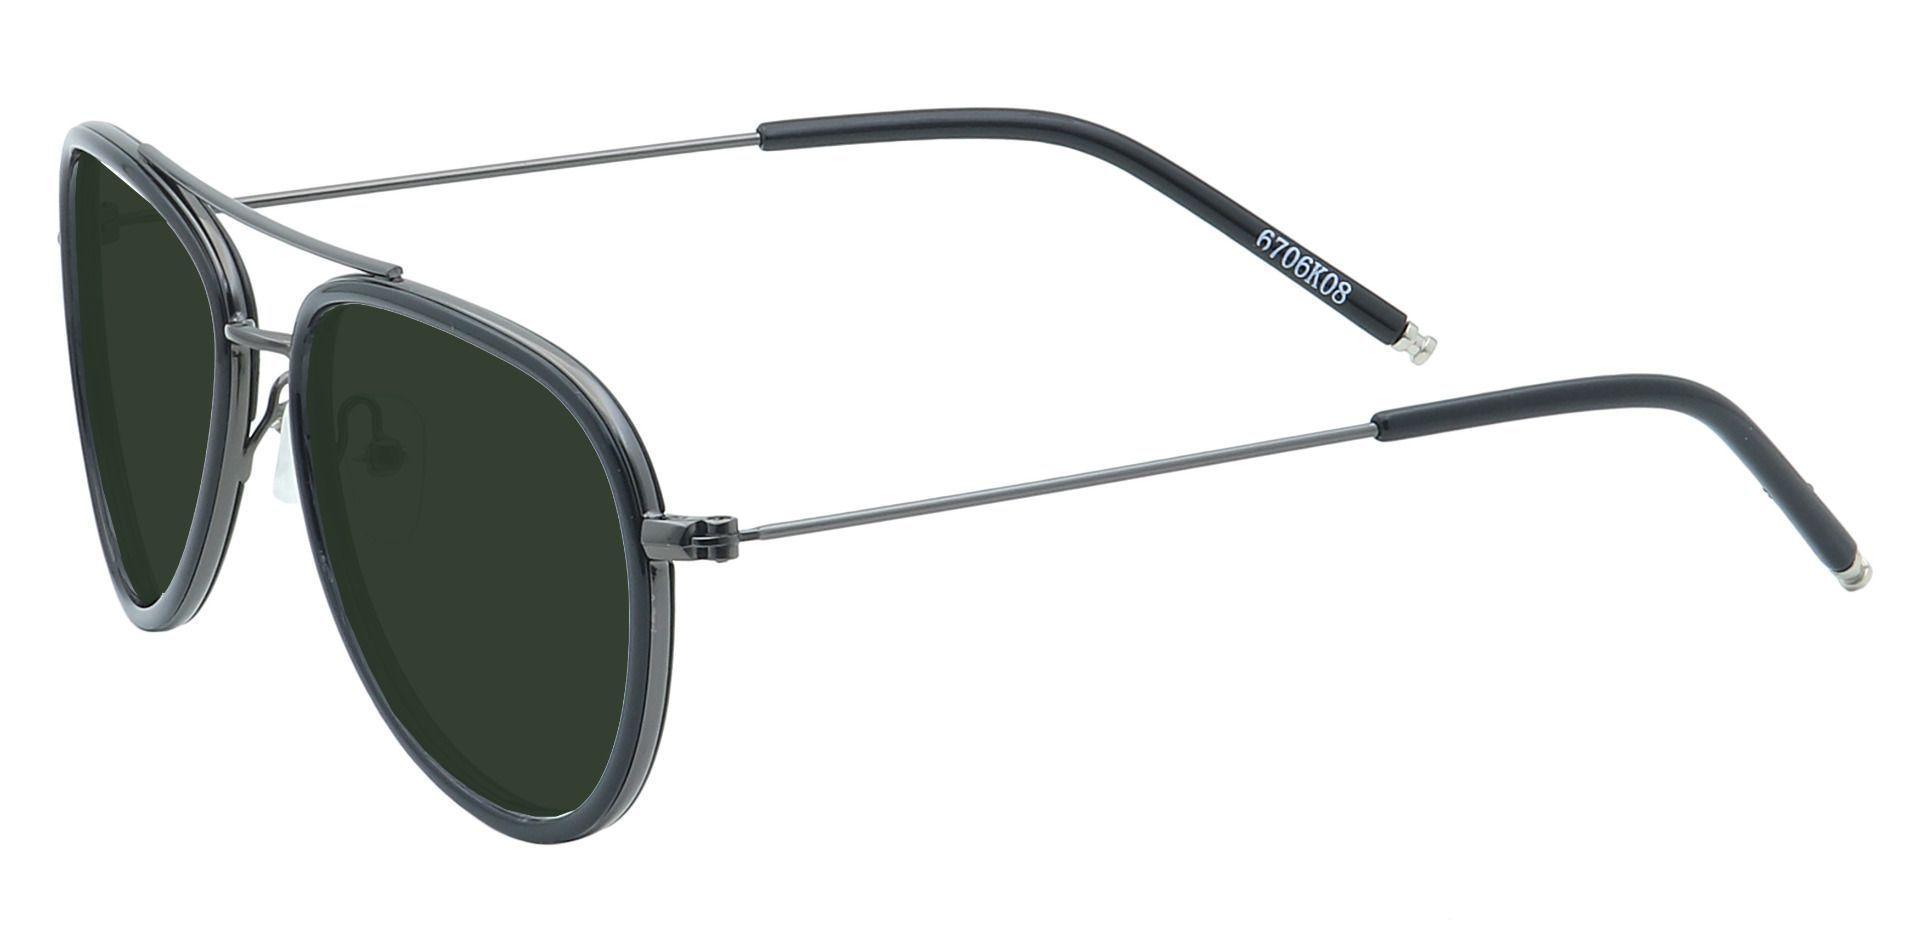 Ace Aviator Single Vision Sunglasses - Black Frame With Green Lenses